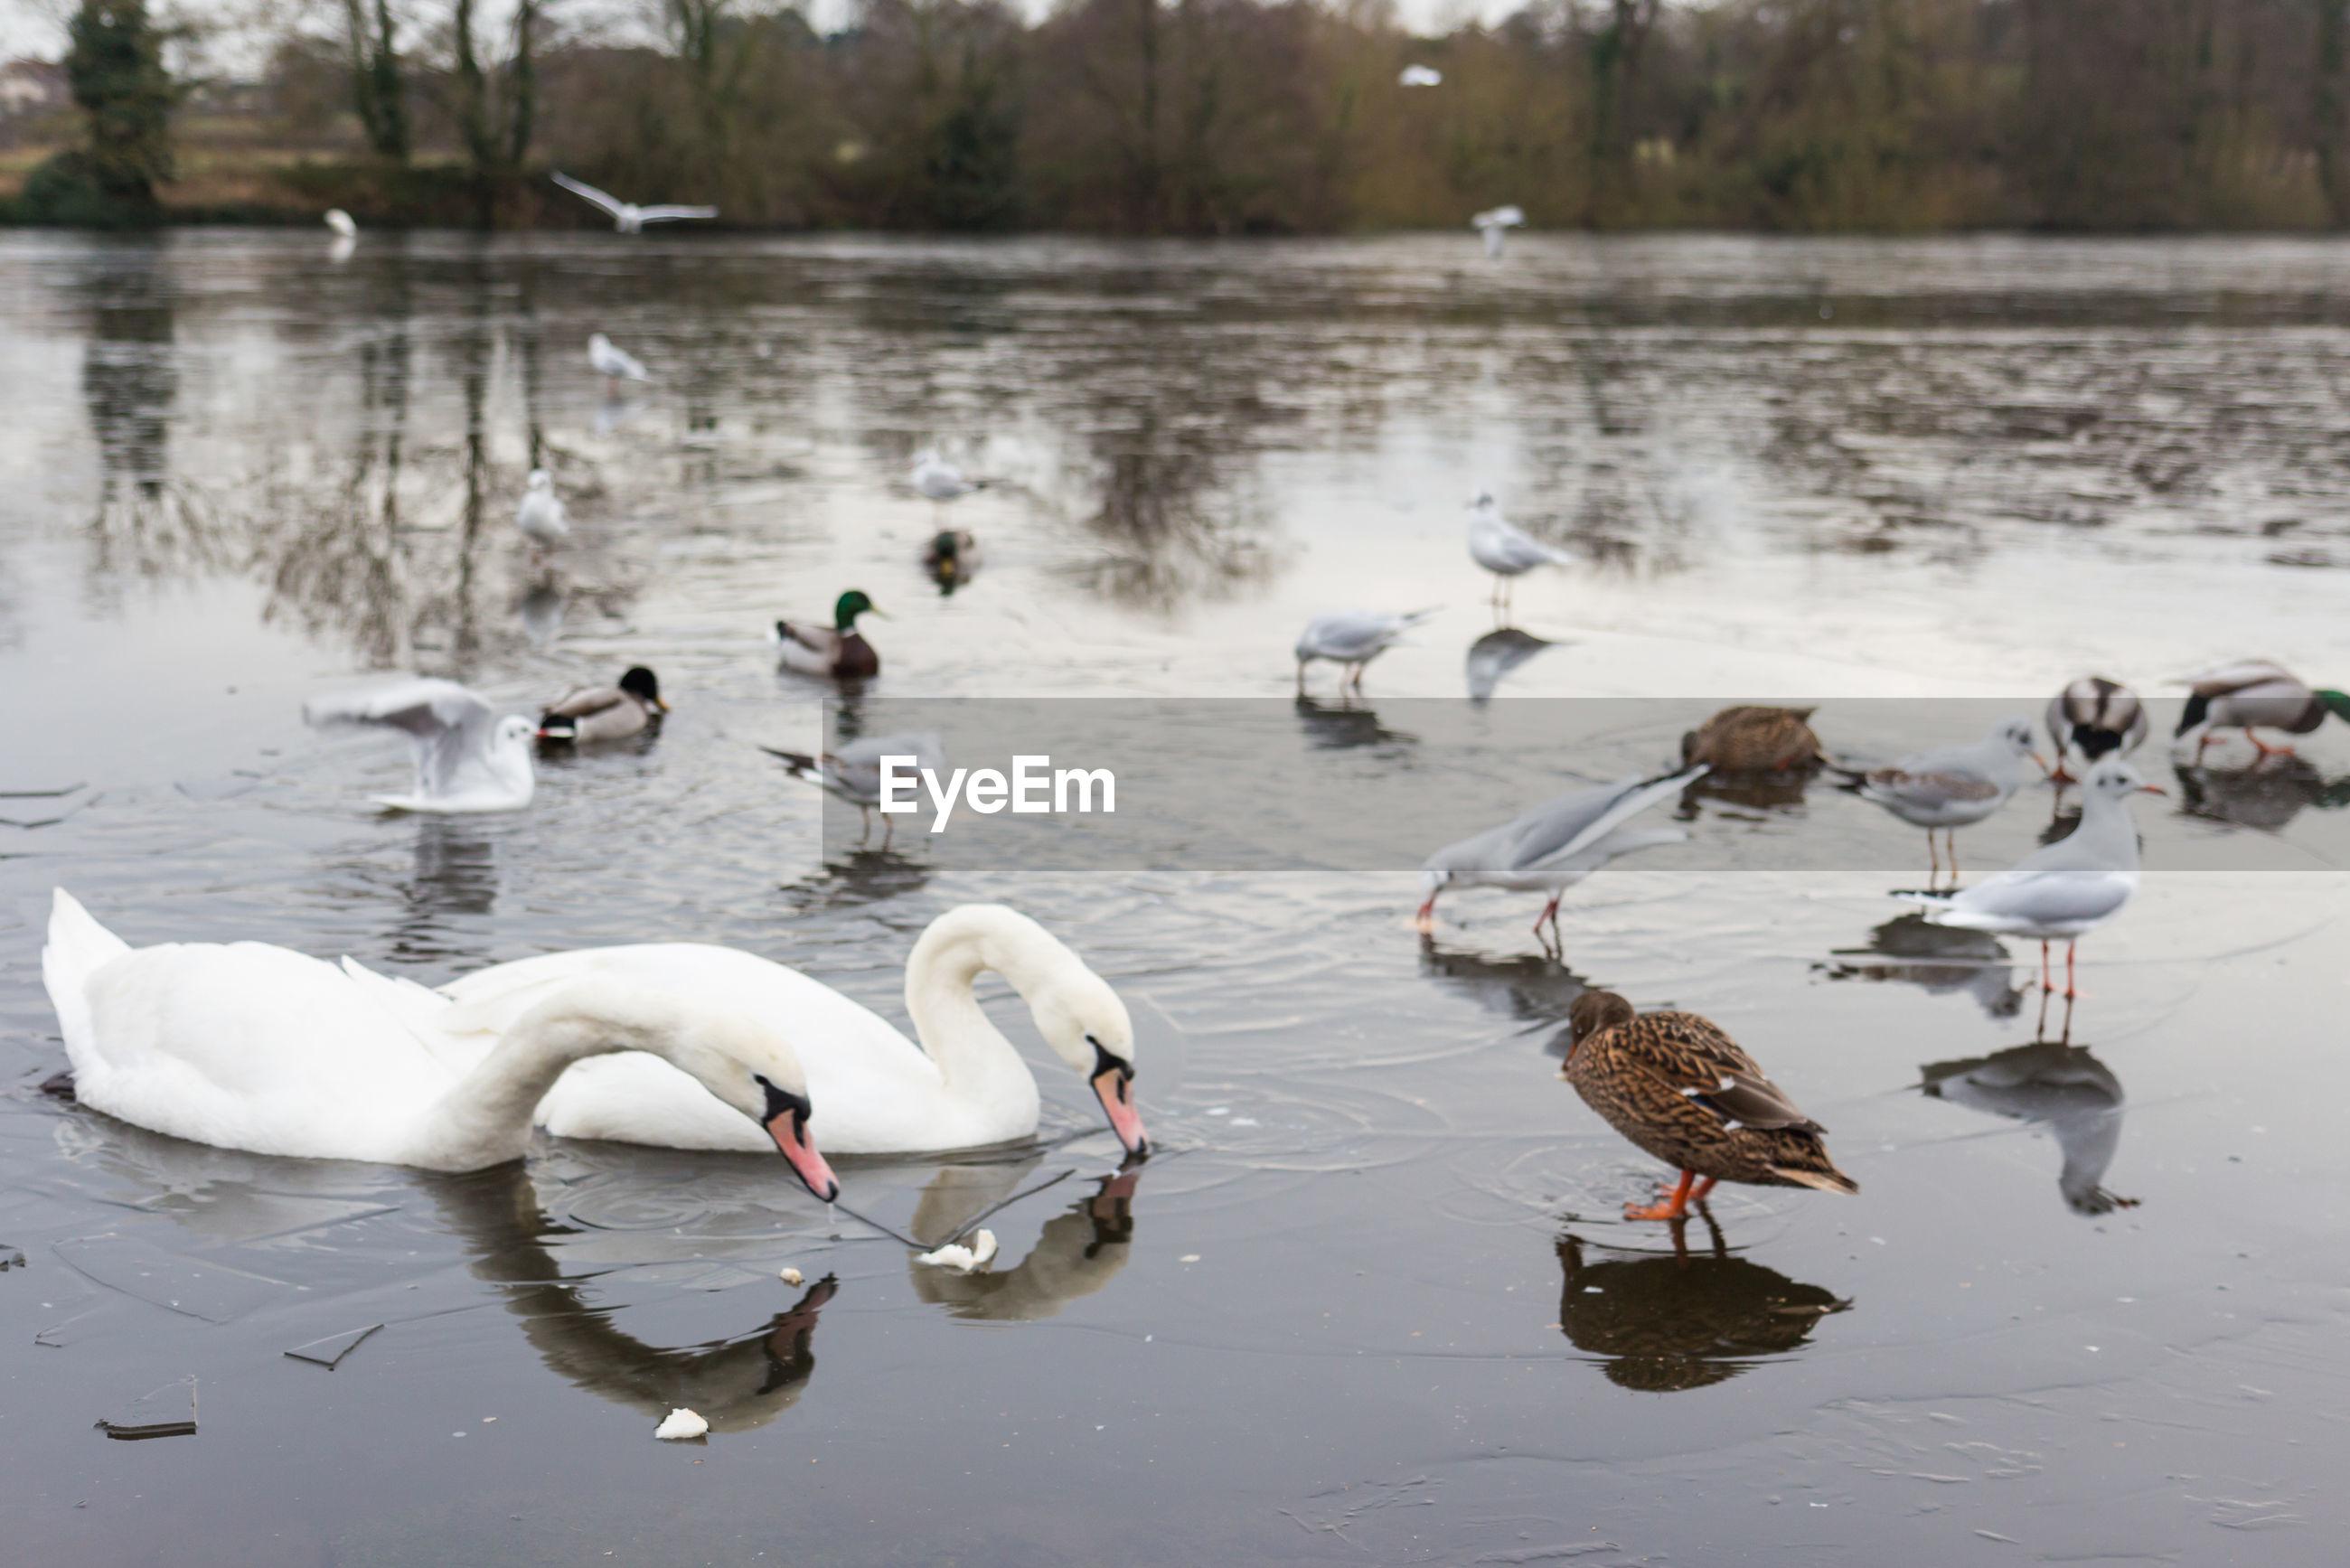 Birds on lake during winter